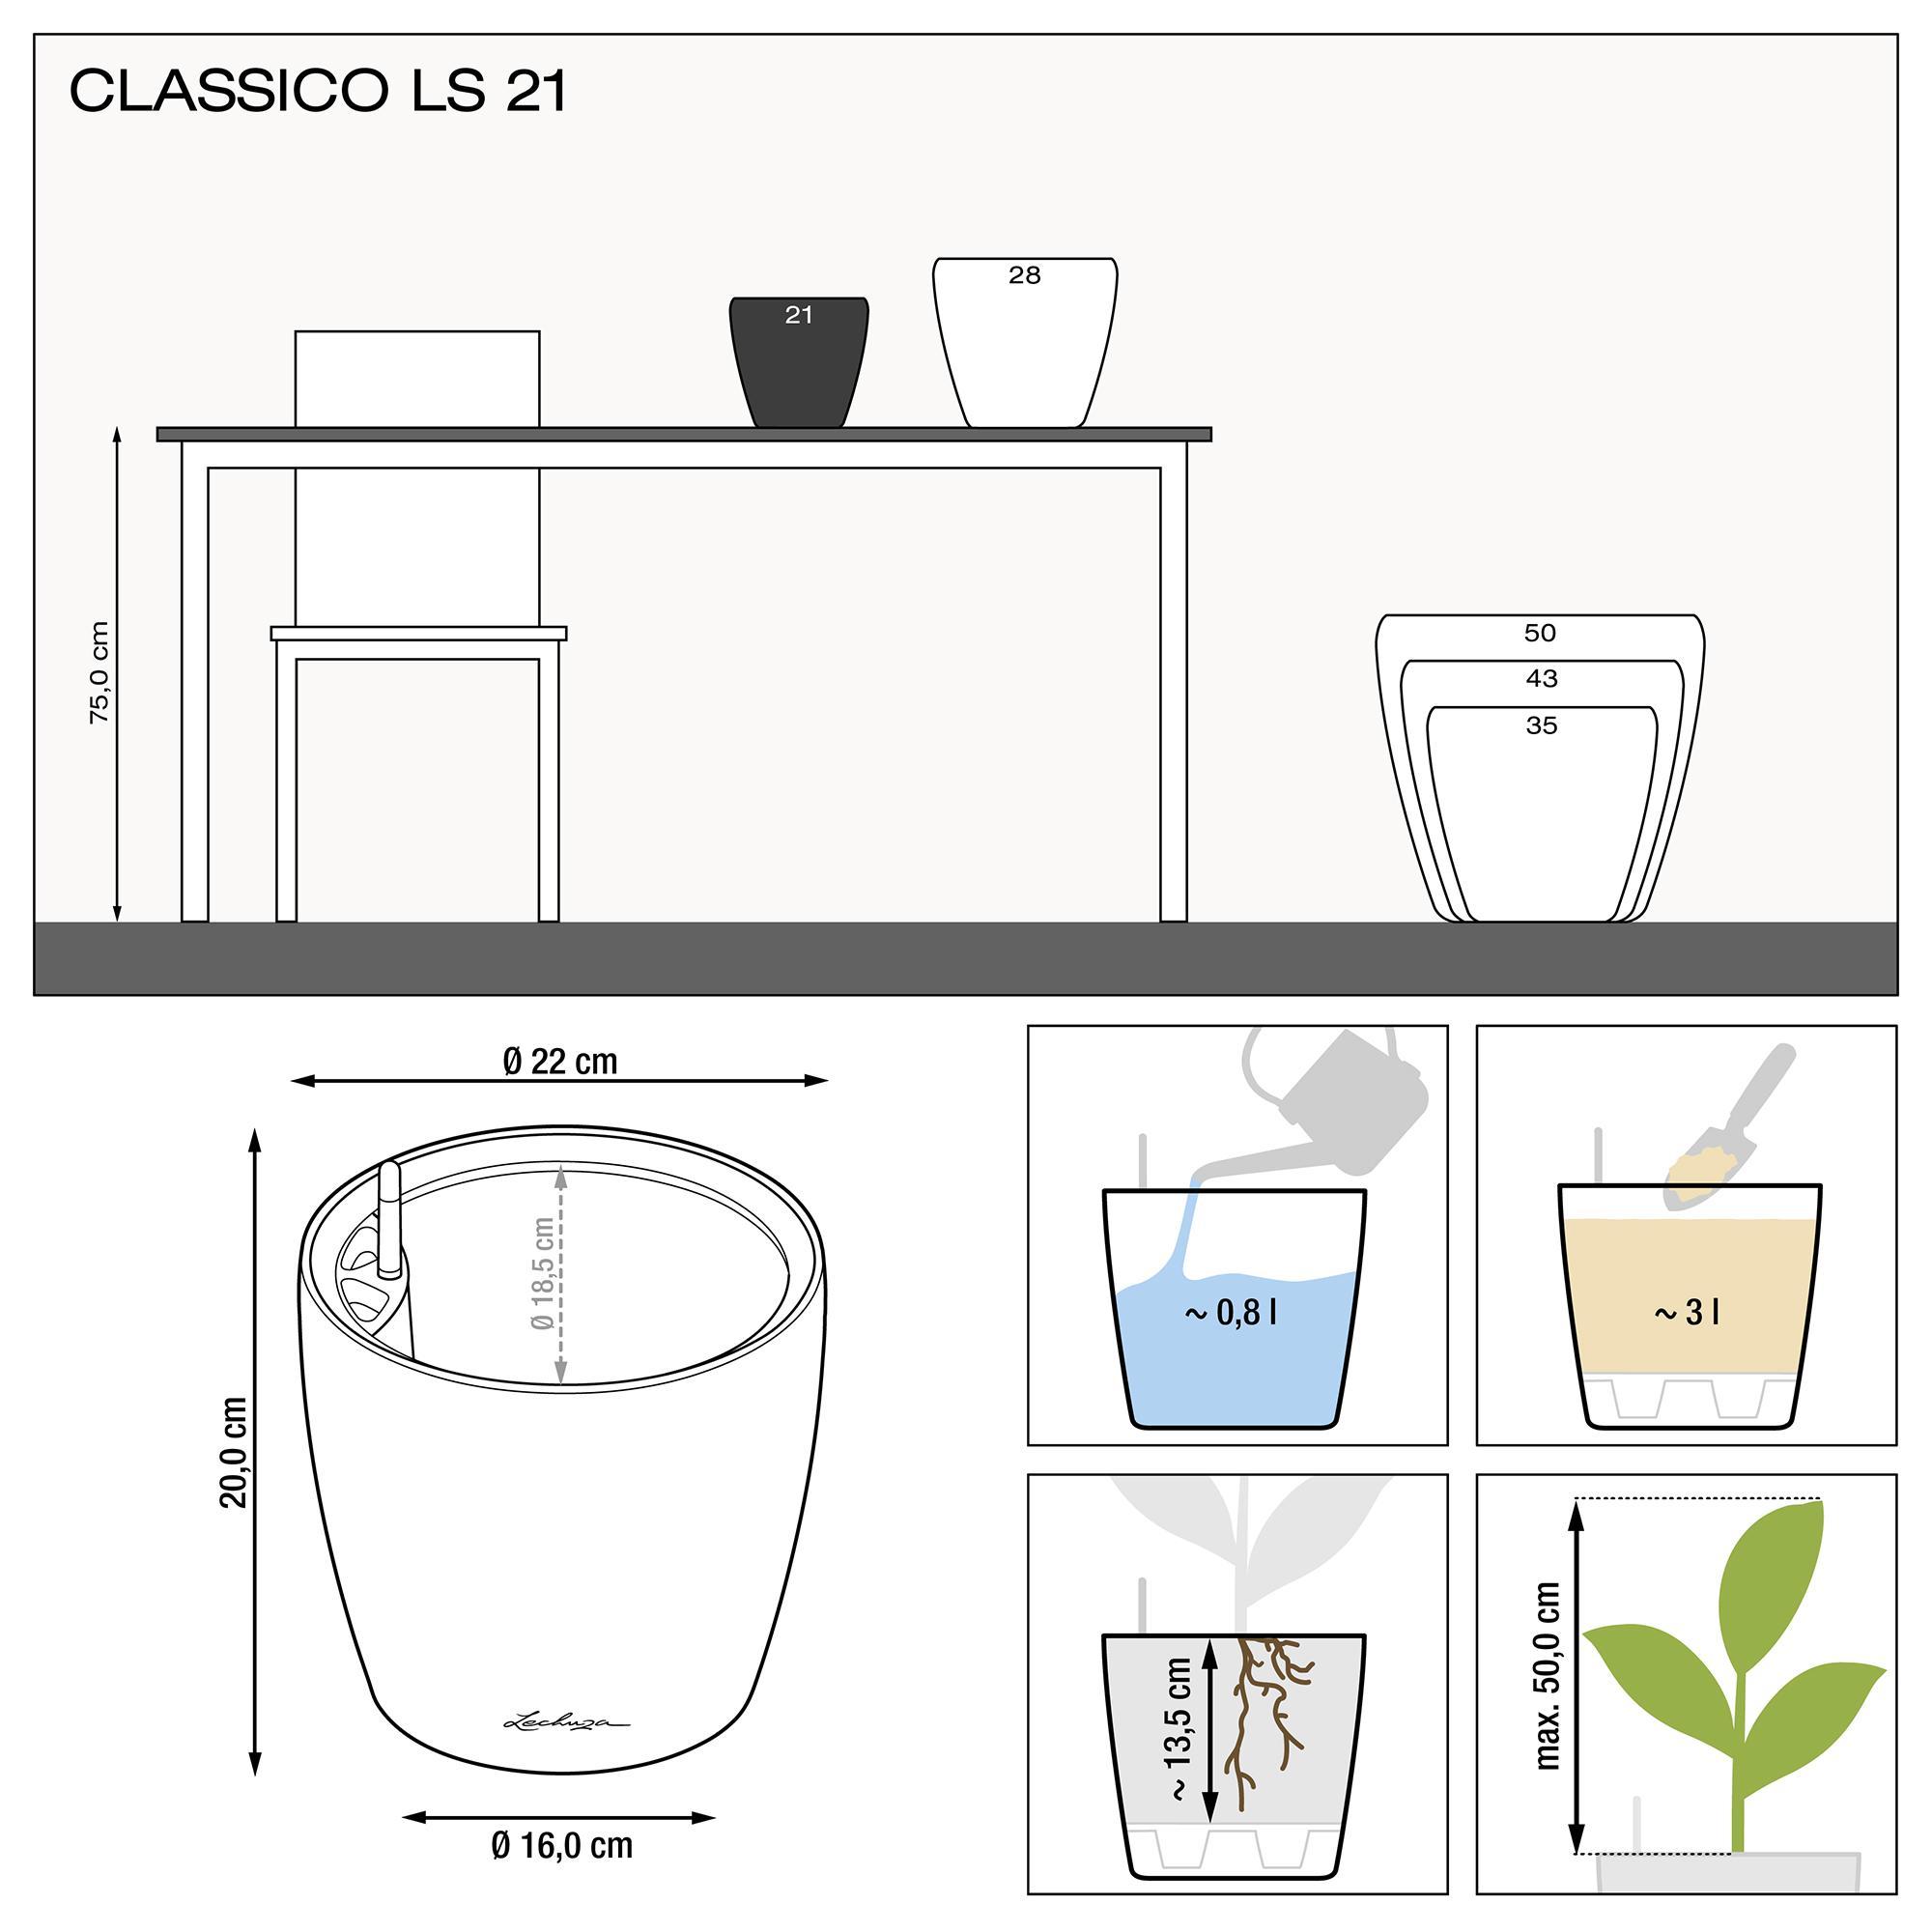 CLASSICO LS 21 white high-gloss - Image 3